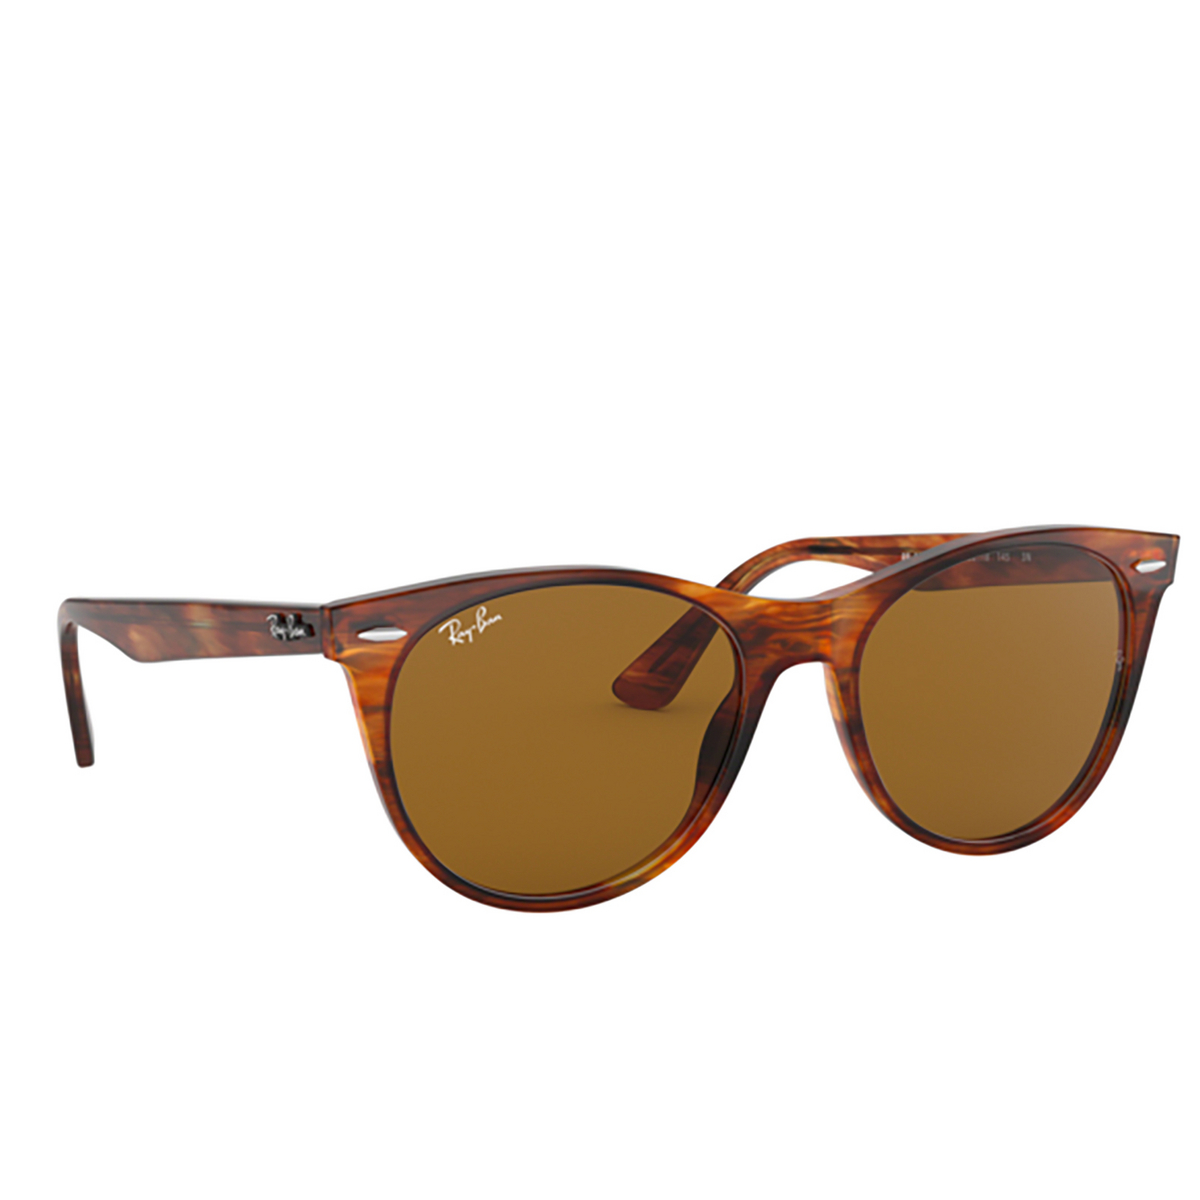 Ray-Ban® Square Sunglasses: Wayfarer Ii RB2185 color Striped Havana 954/33 - three-quarters view.